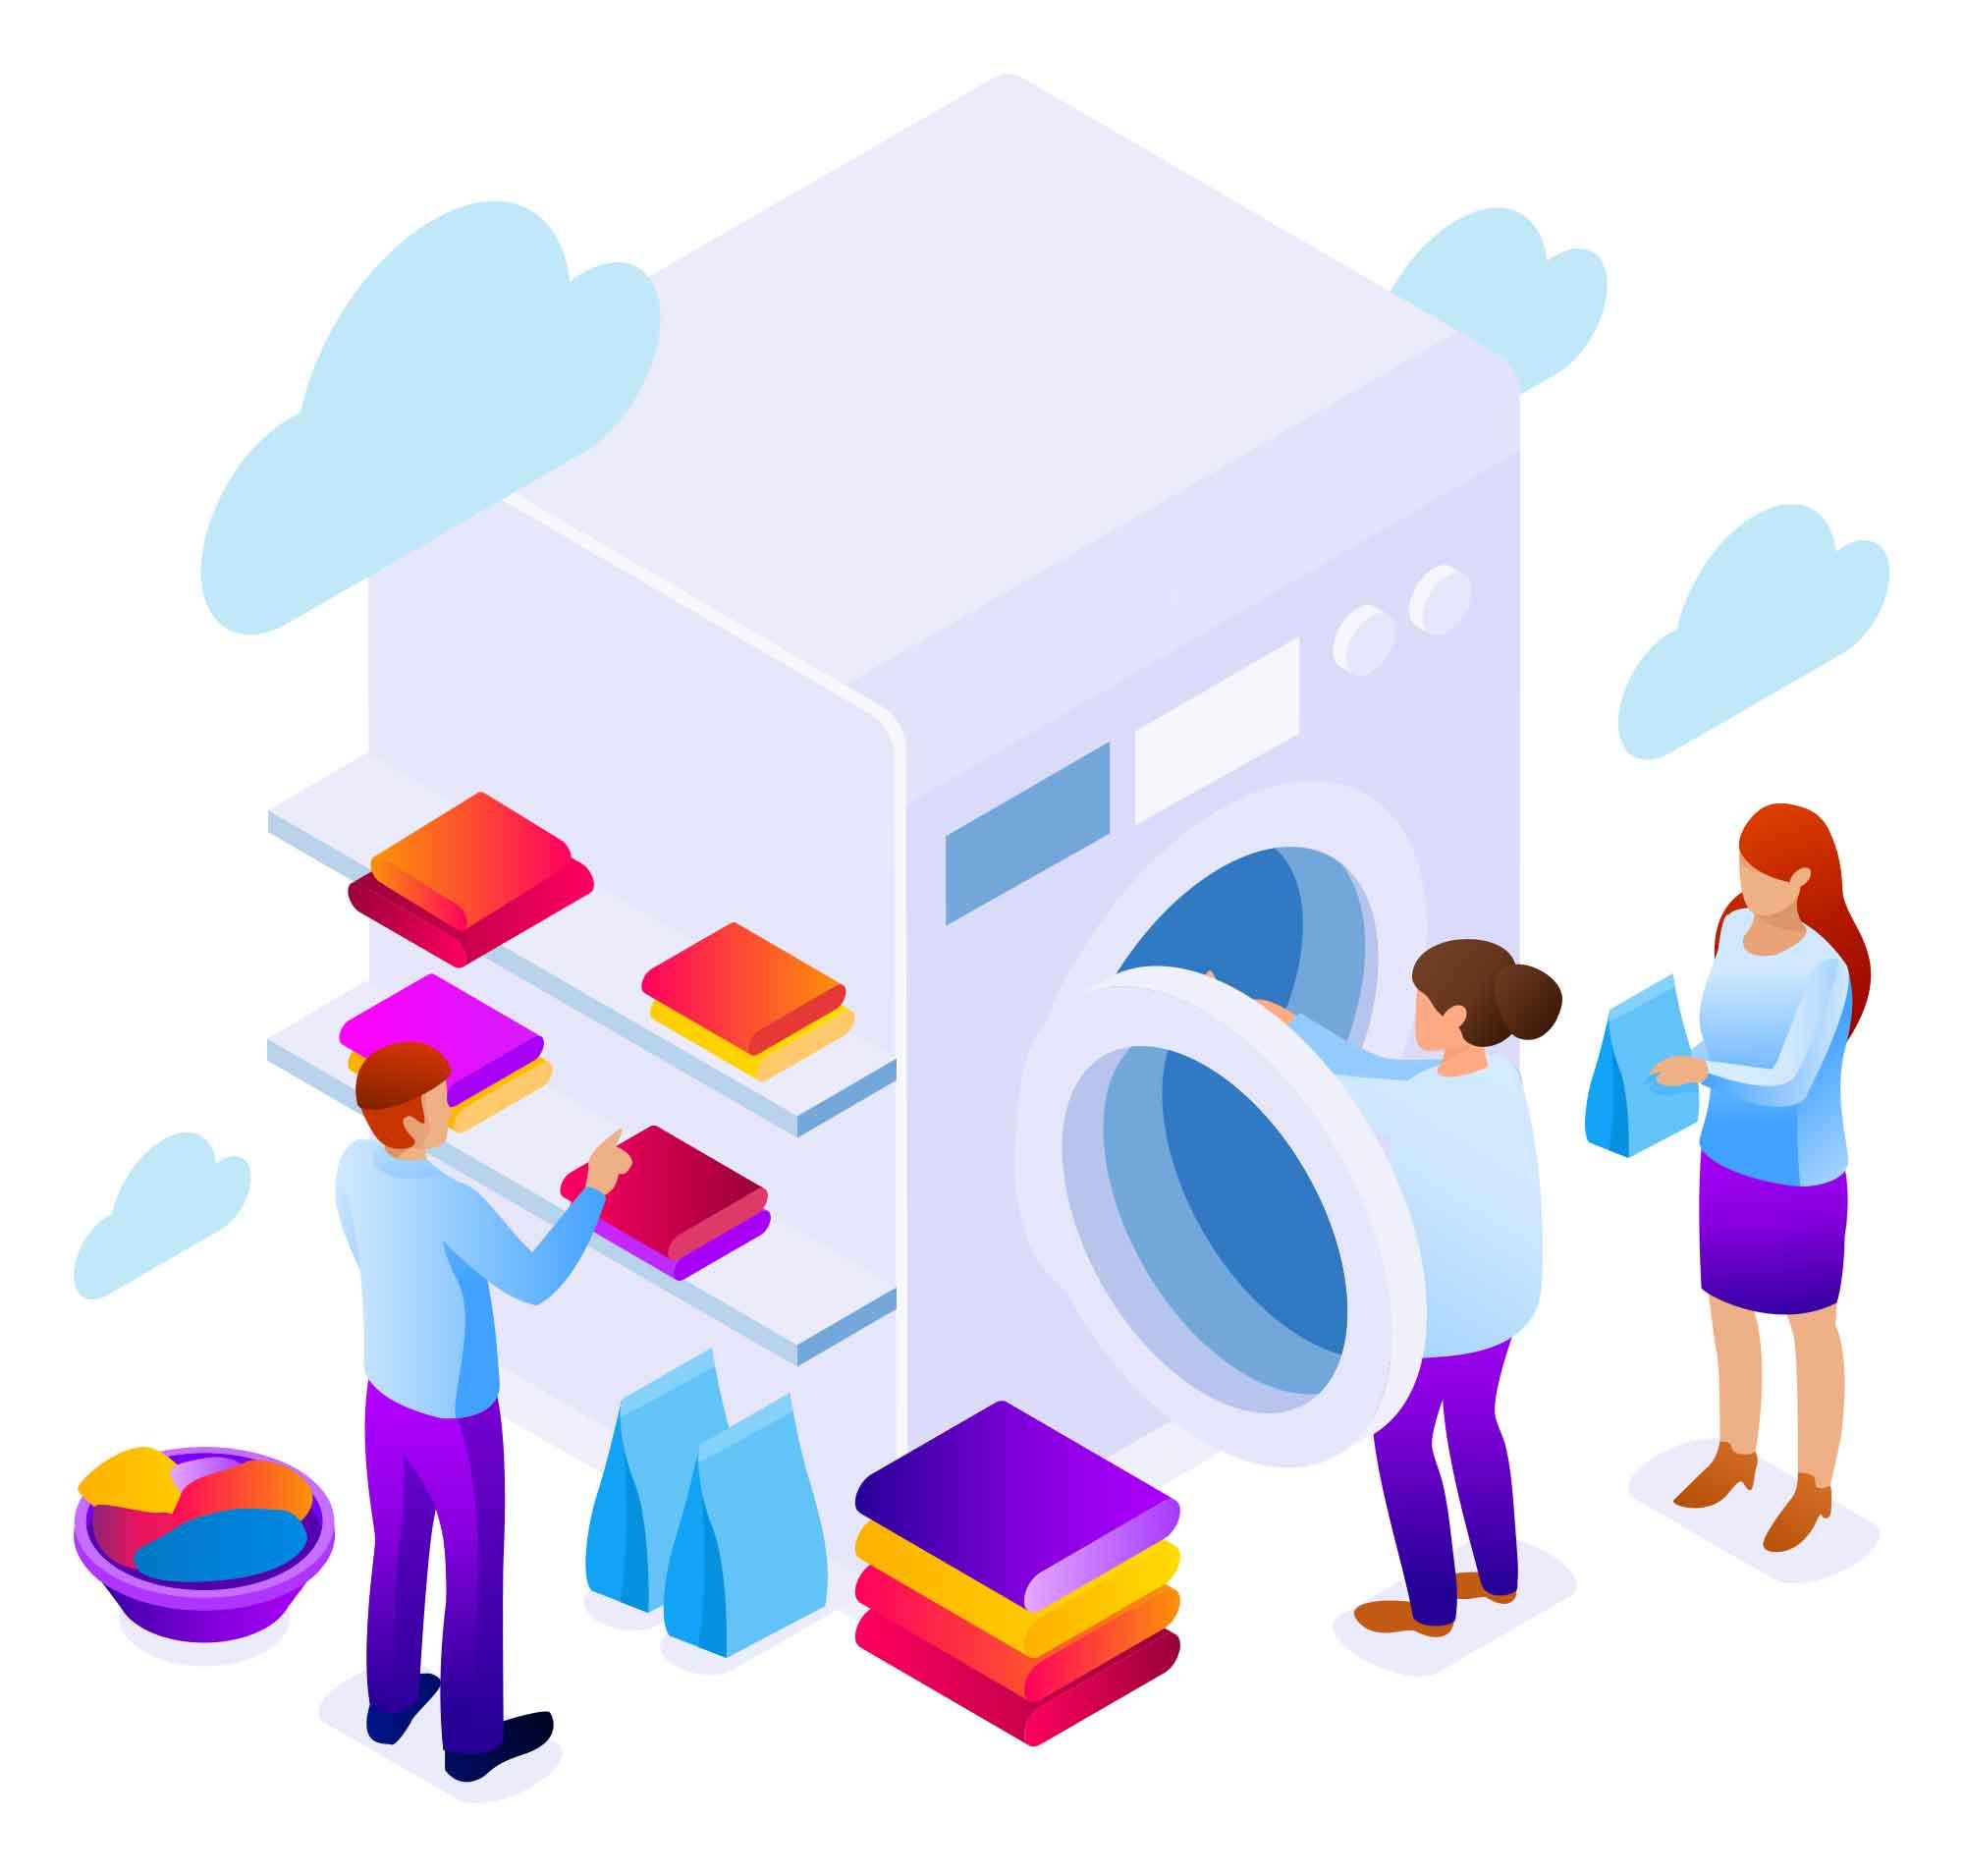 Laundry Vector Illustration